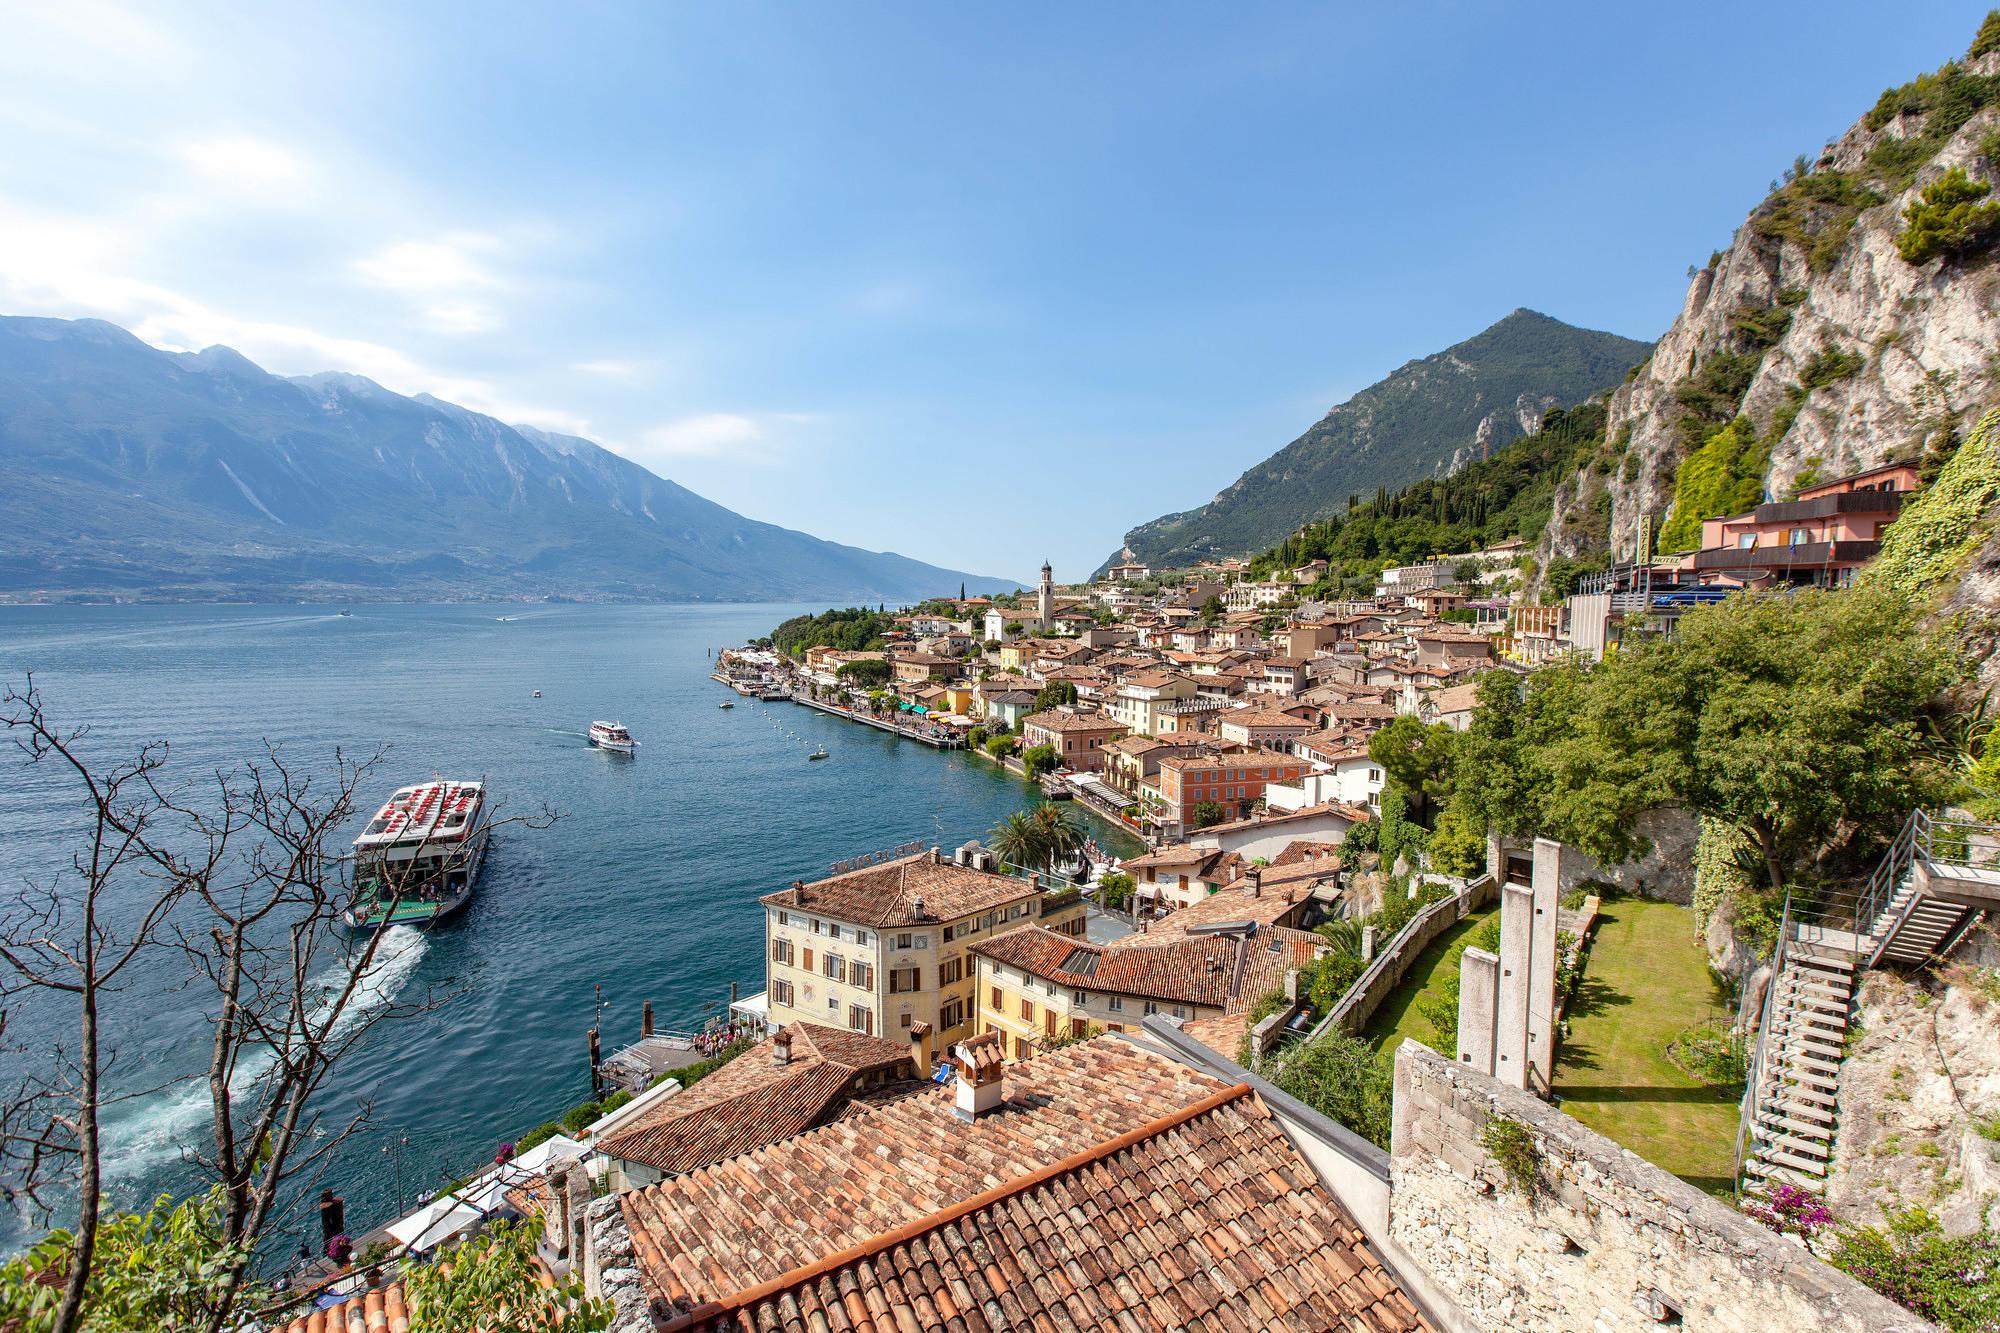 Hotel Castell, Lake Garda, Italy